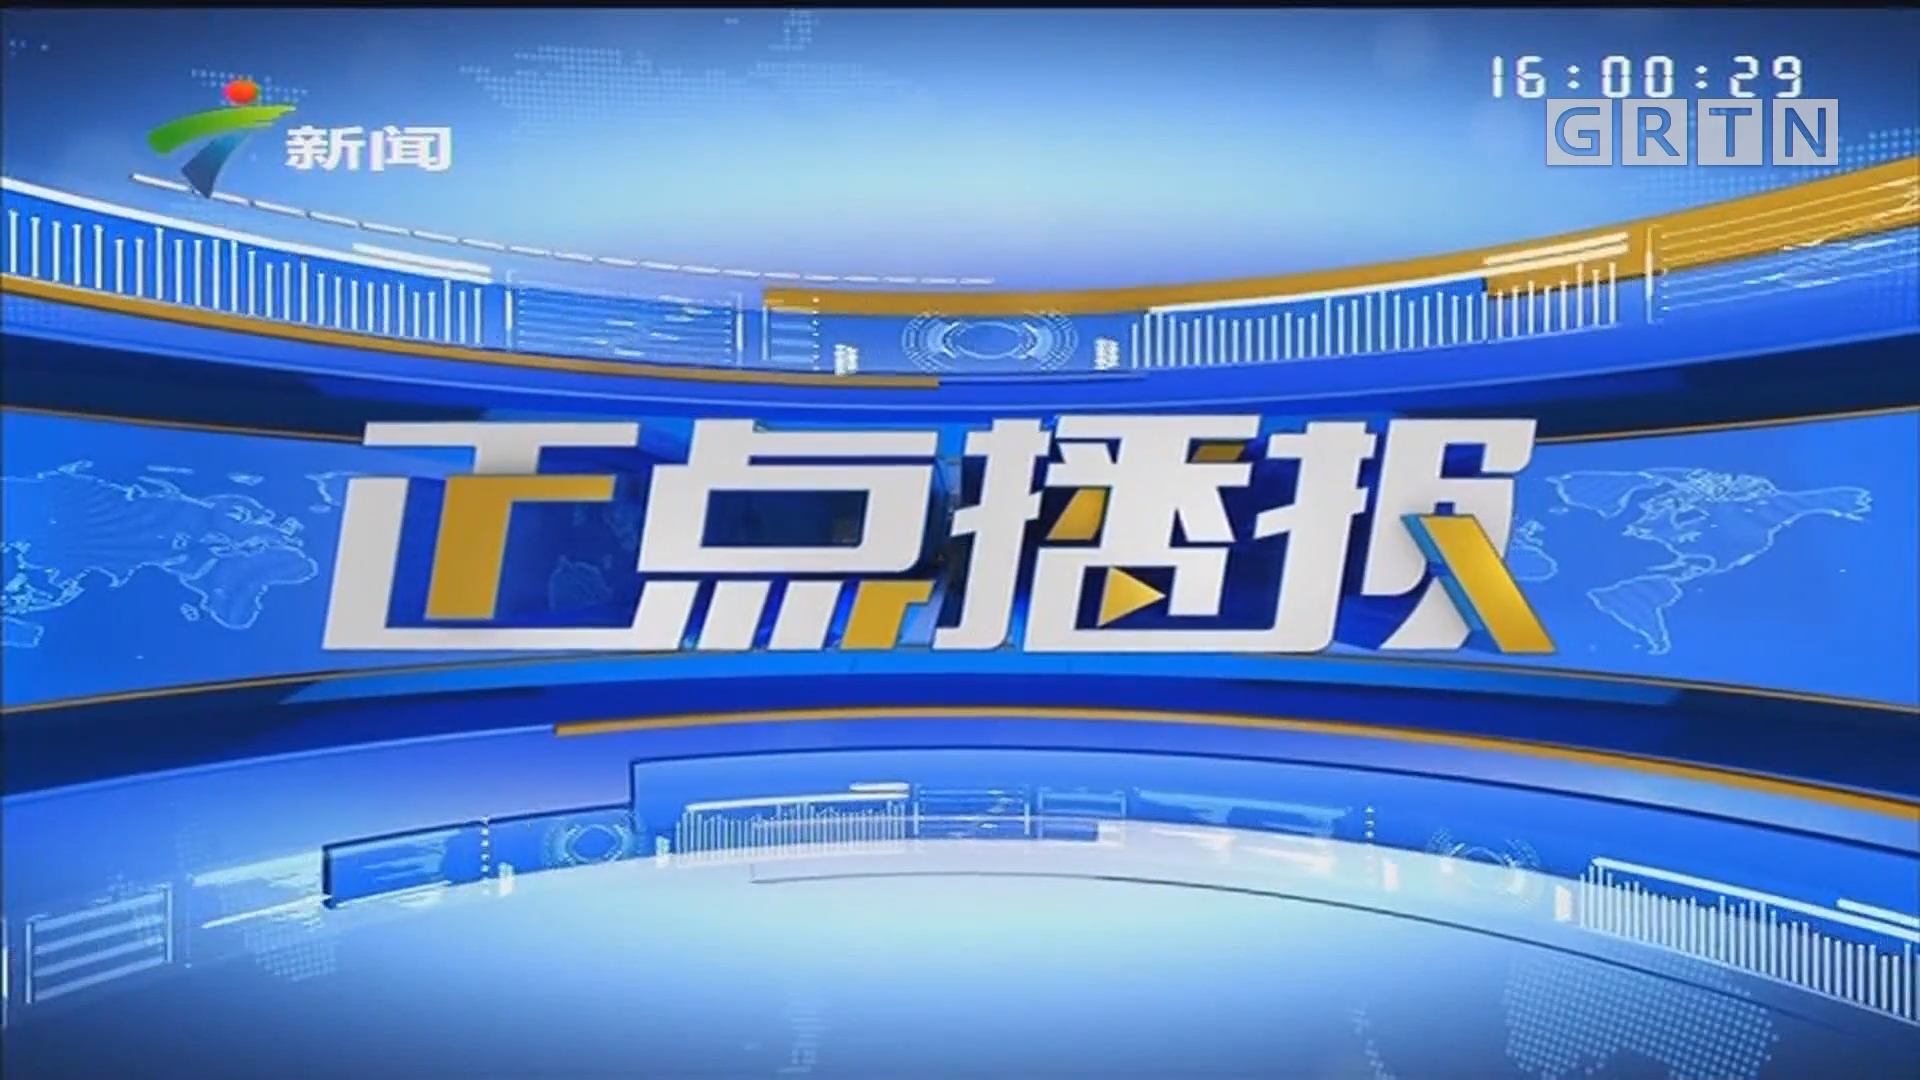 [HD][2019-08-03]正点播报:广州:今起海珠桥临时封闭机动车道!记者直击封桥影响